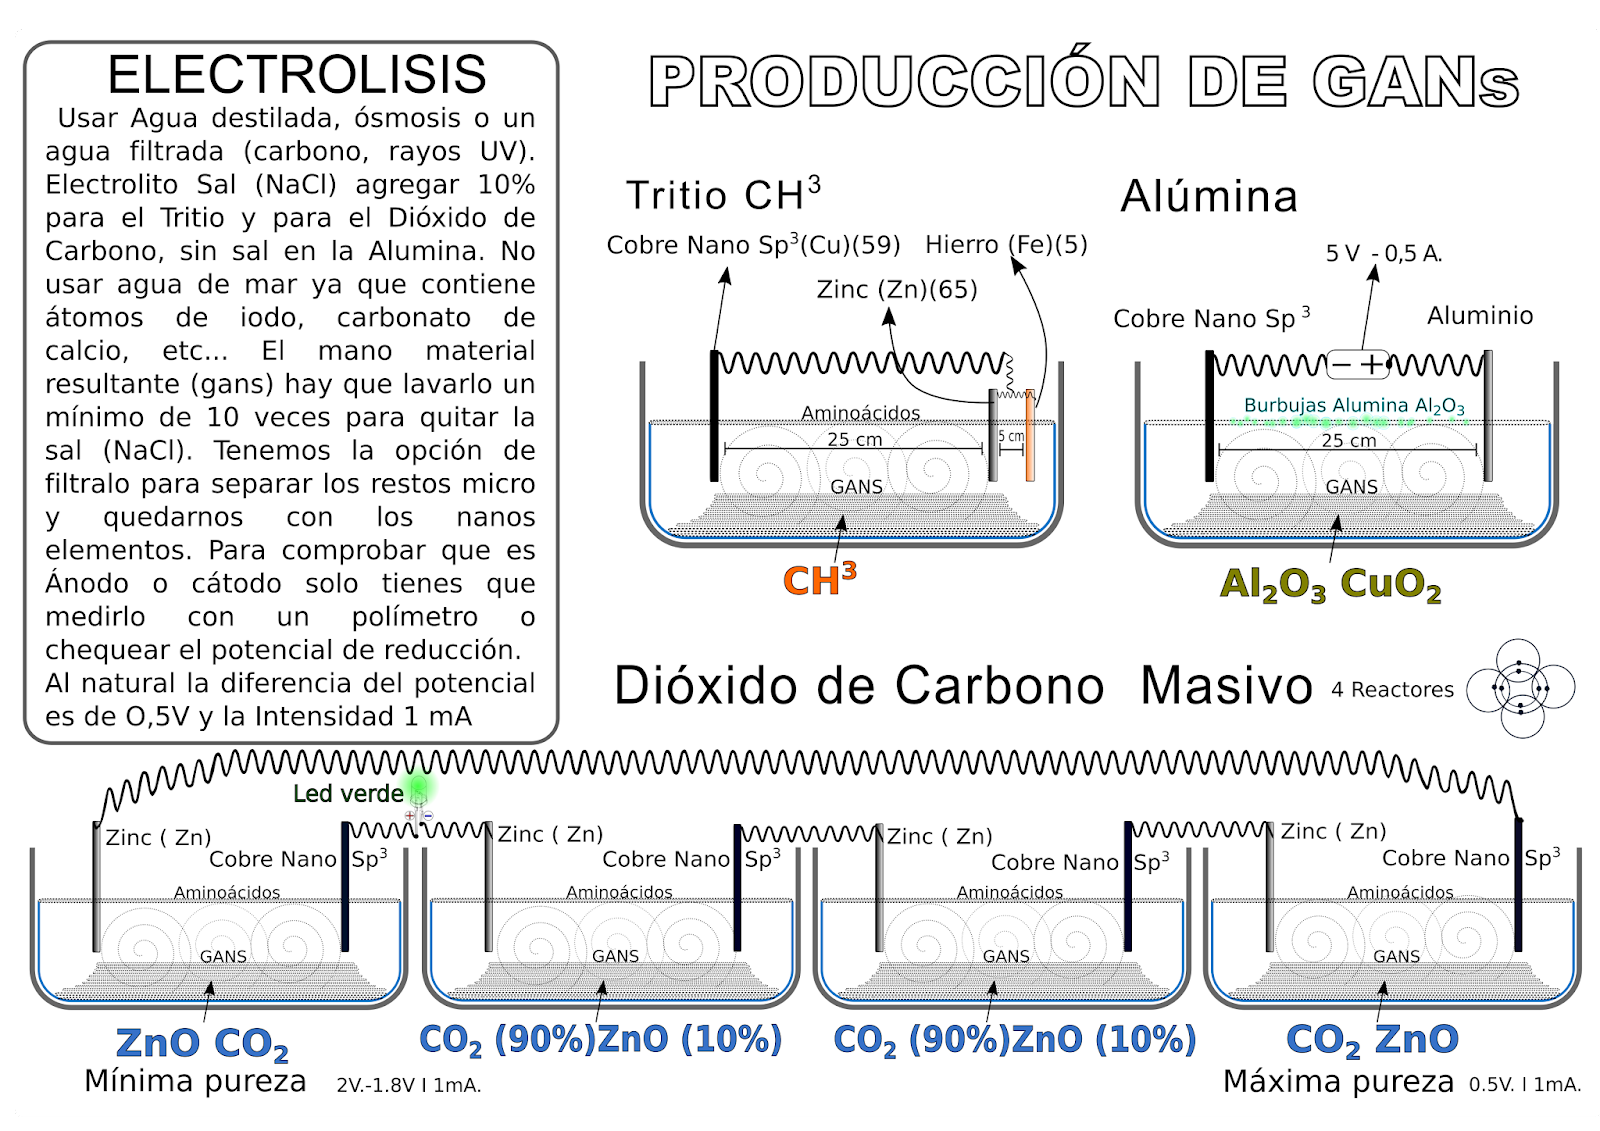 Electrolisis tritio alumina co2 masiva Gans - produccion.png